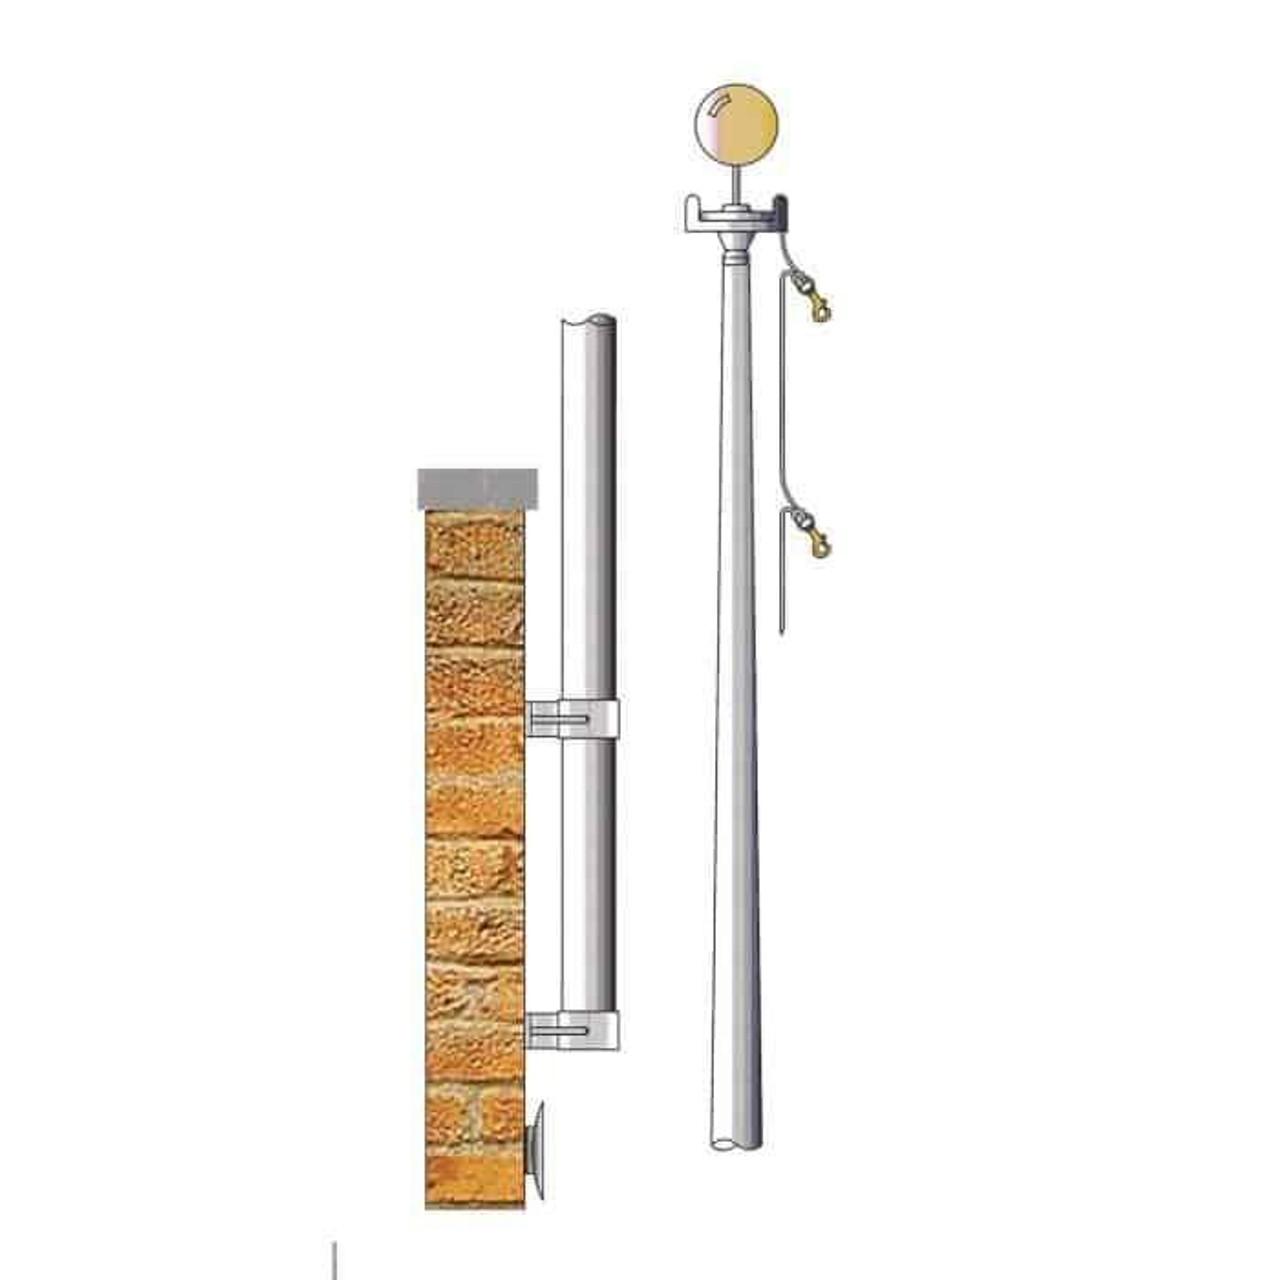 17 Vertical Wall Mounted Flagpole EVWM17